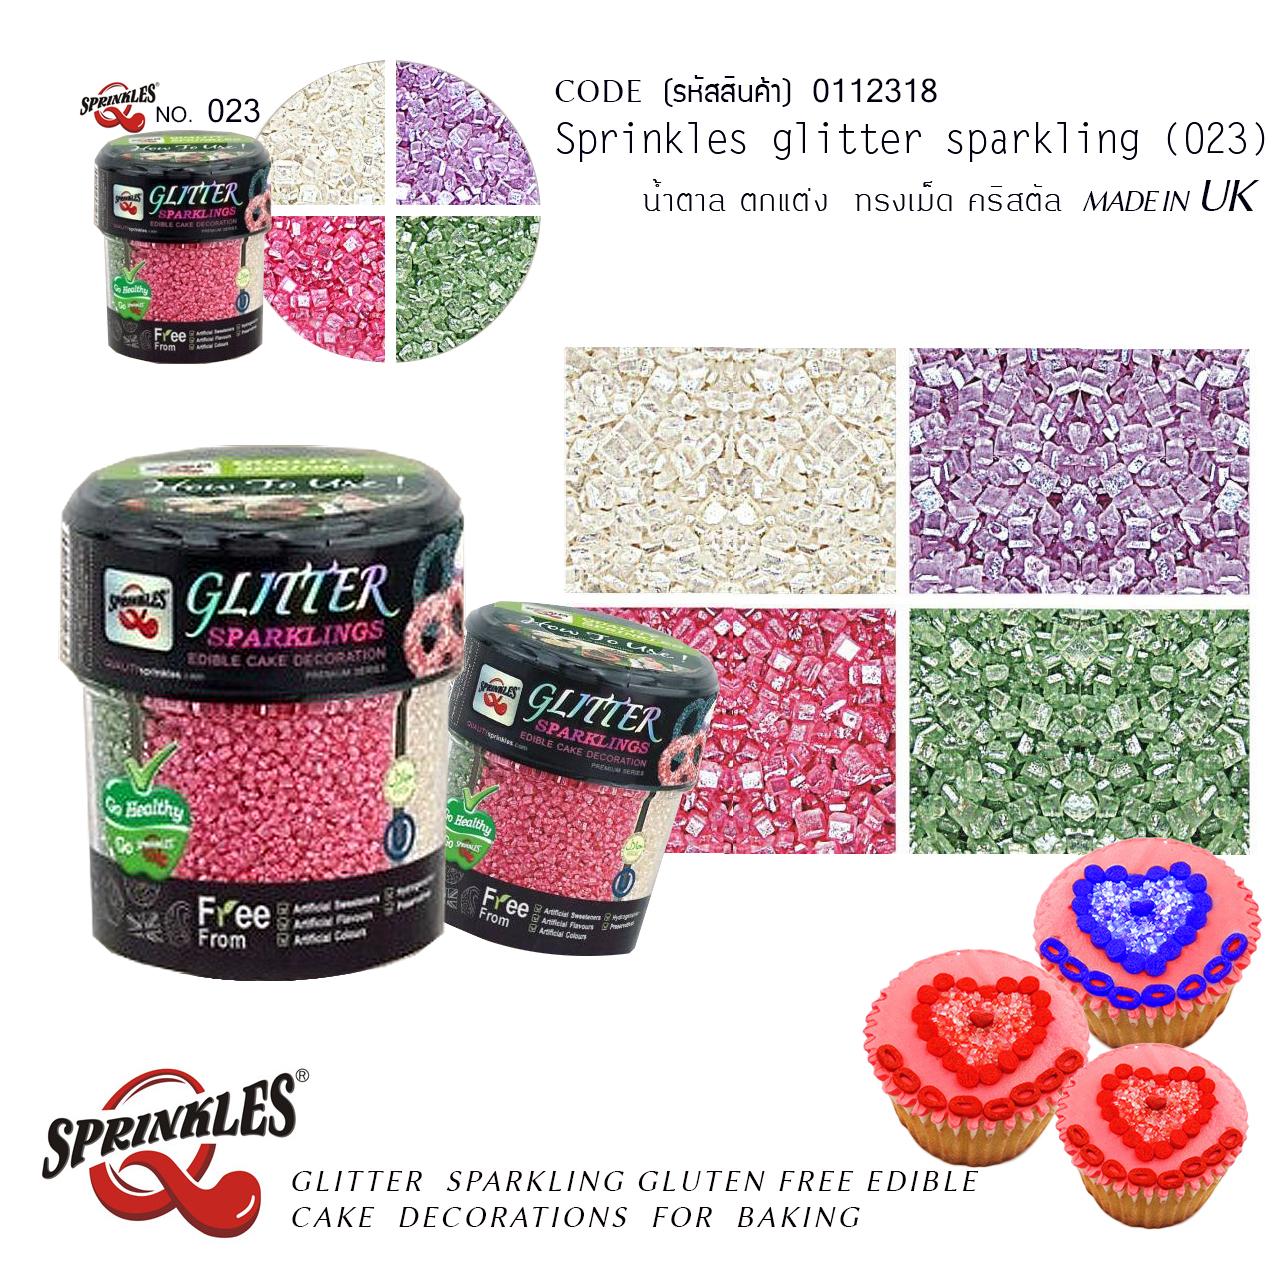 Sprinkles glitter sparkling (023)